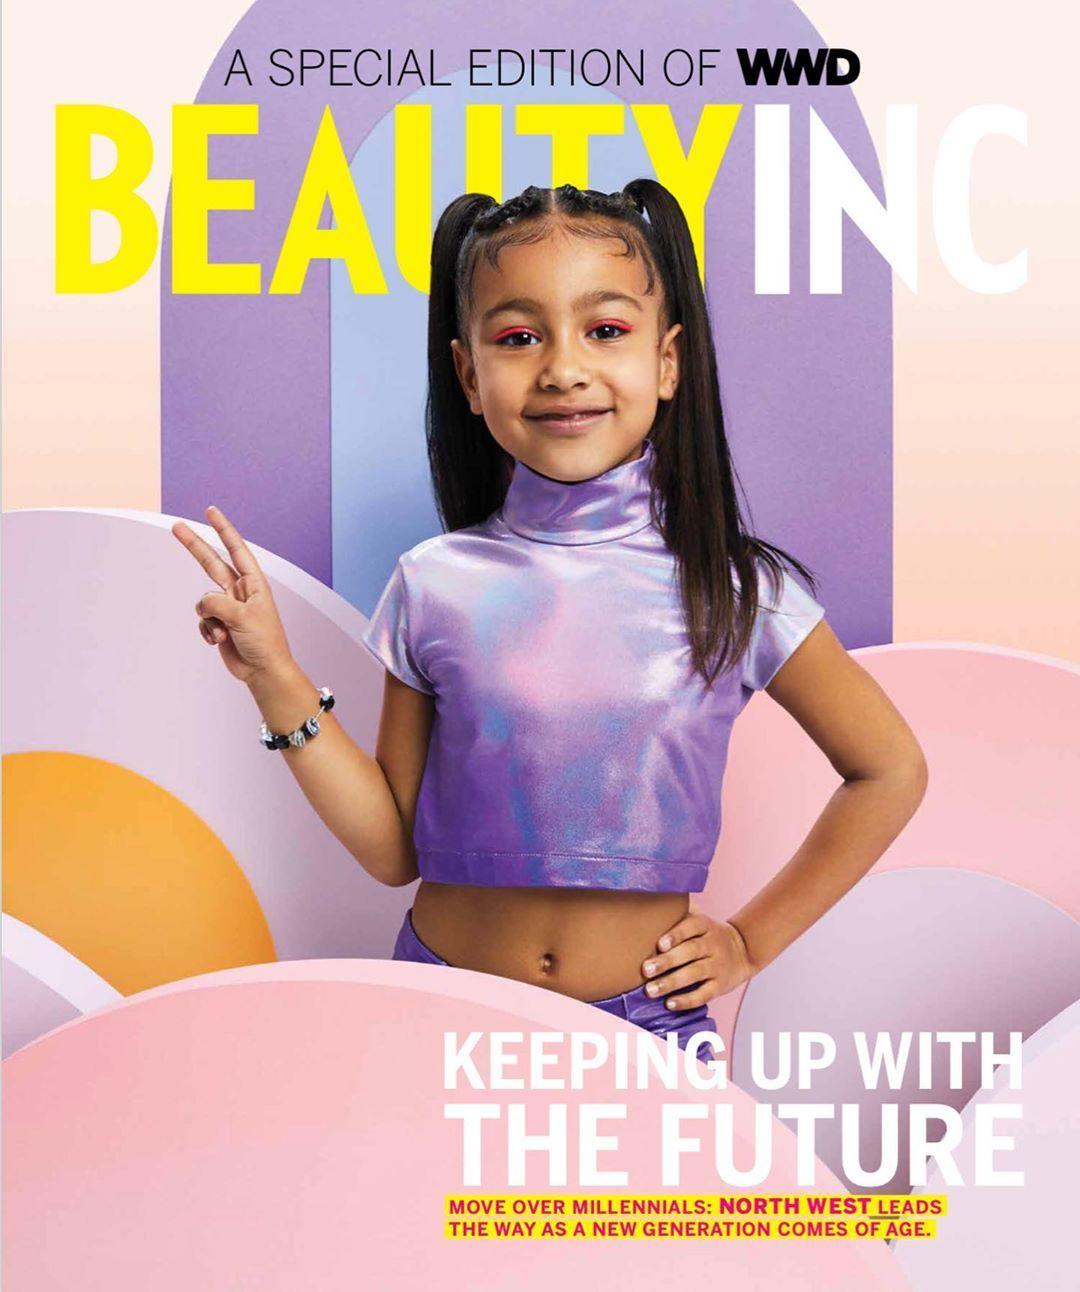 North West Lands Her First Solo Magazine Cover At Age 5 Naijadome Celebrity Kids Fashion North West Kardashian Kim Kardashian